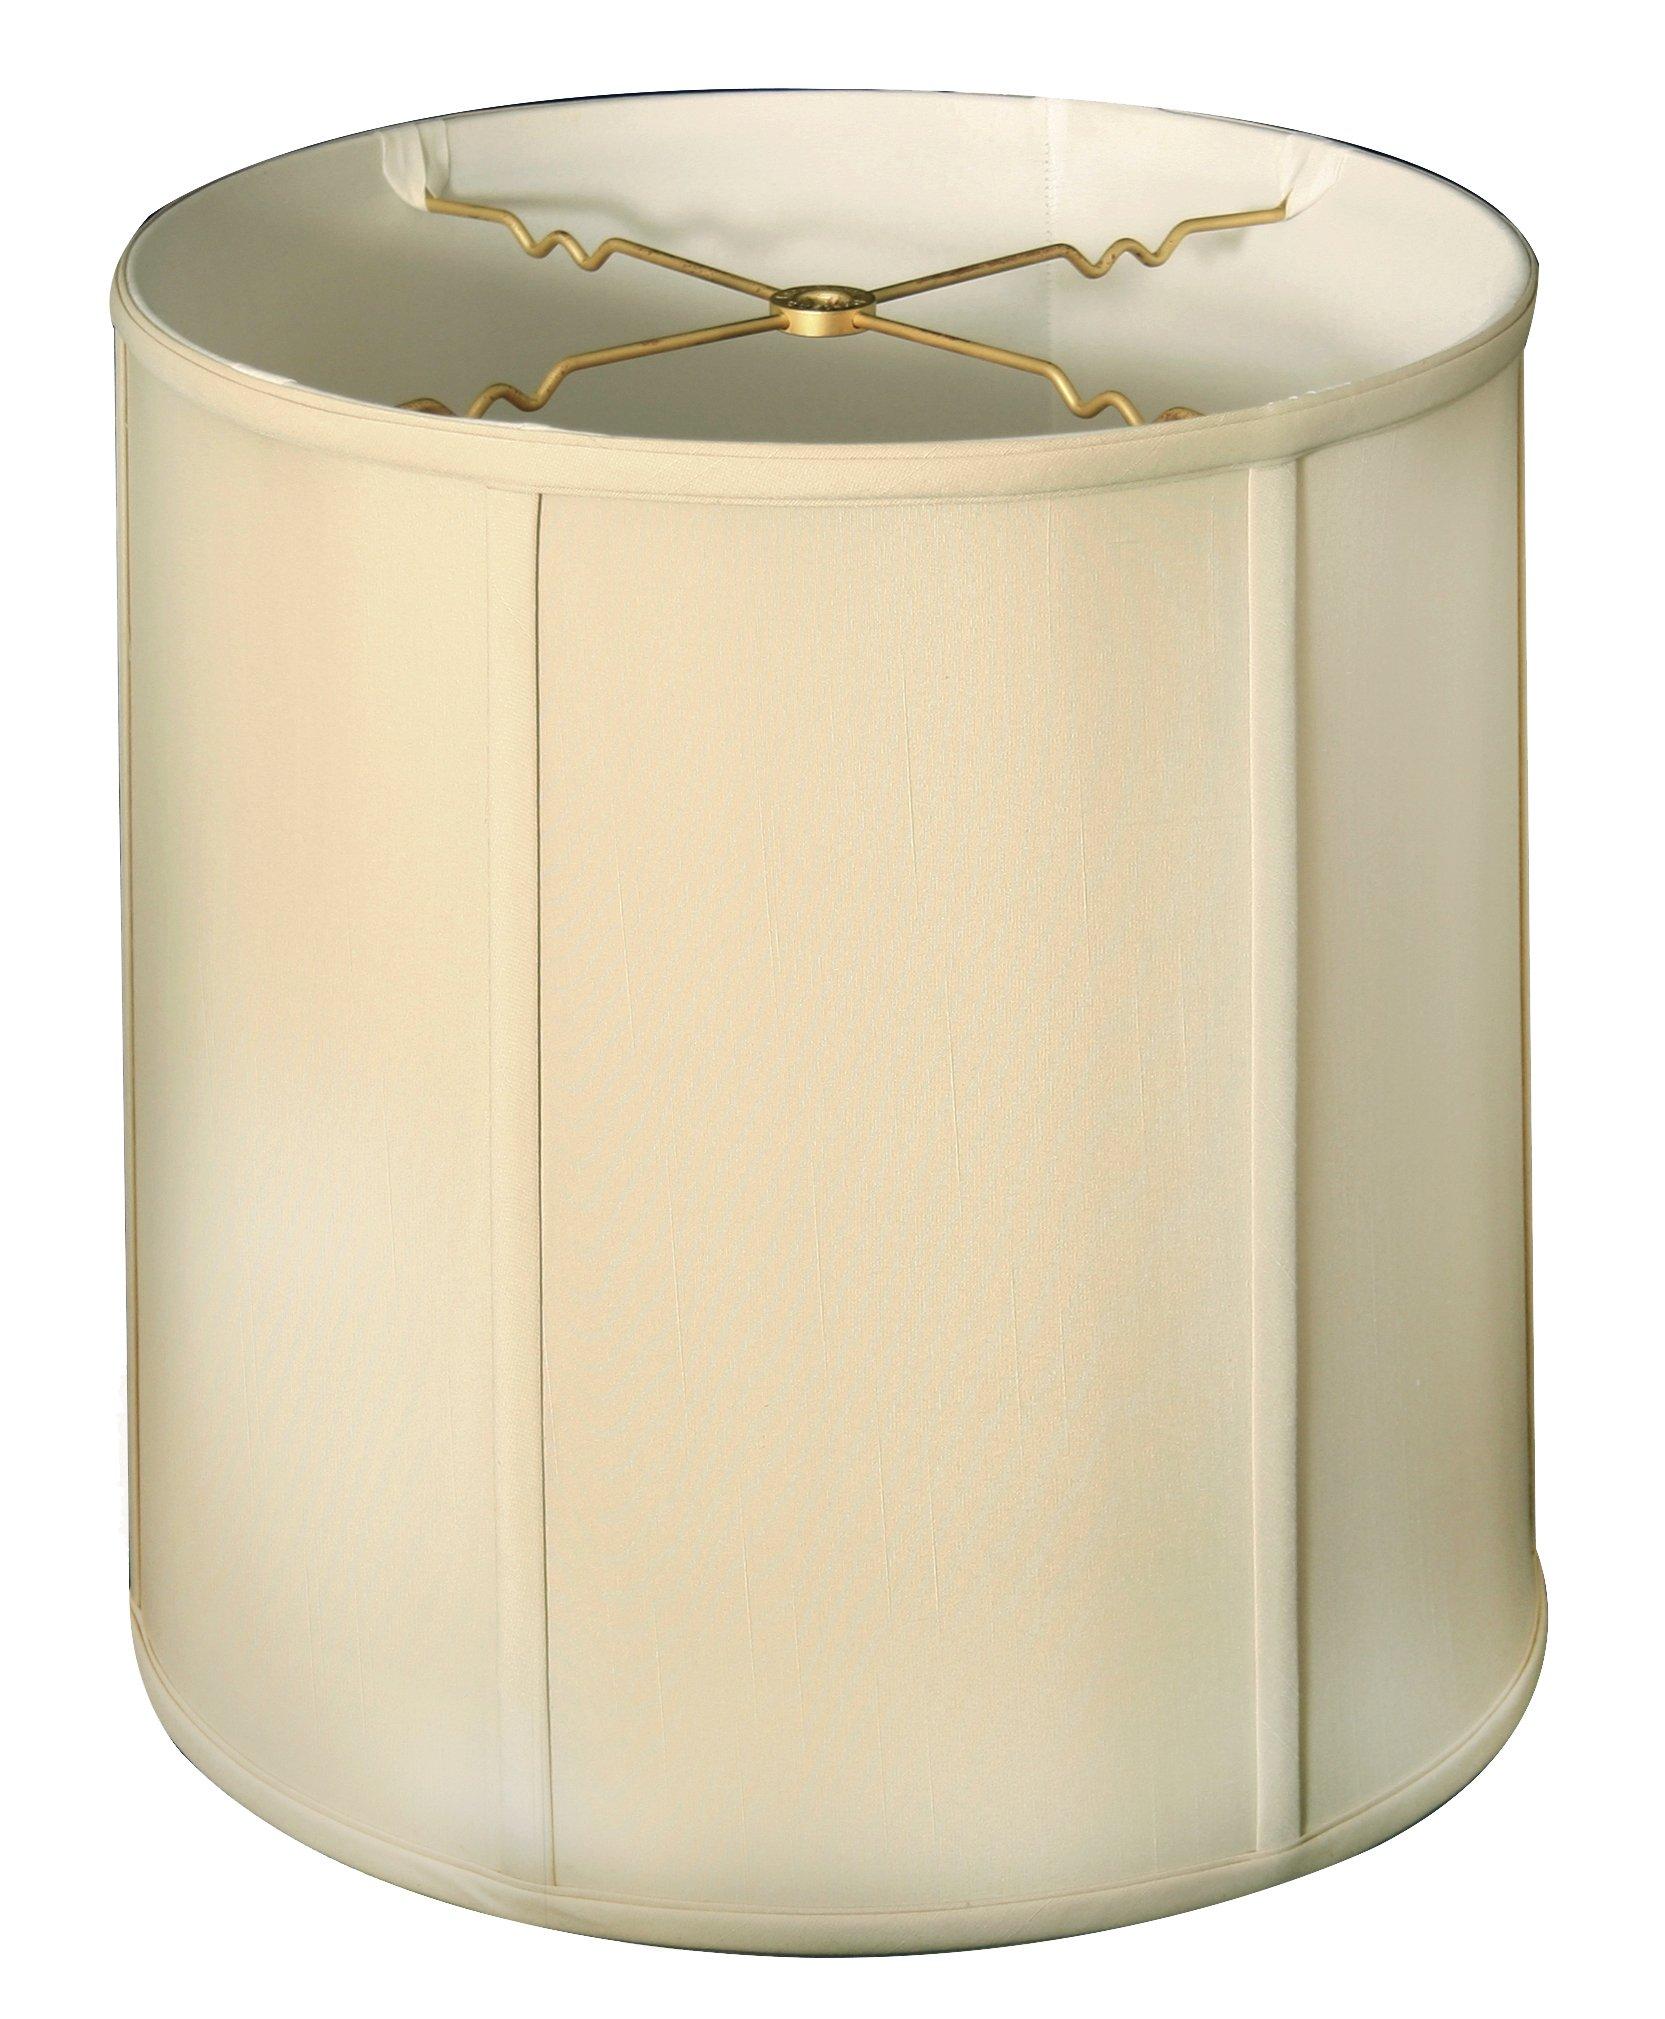 Royal Designs Basic Drum Lamp Shade, Beige, 15 x 16 (BS-719-16BG)